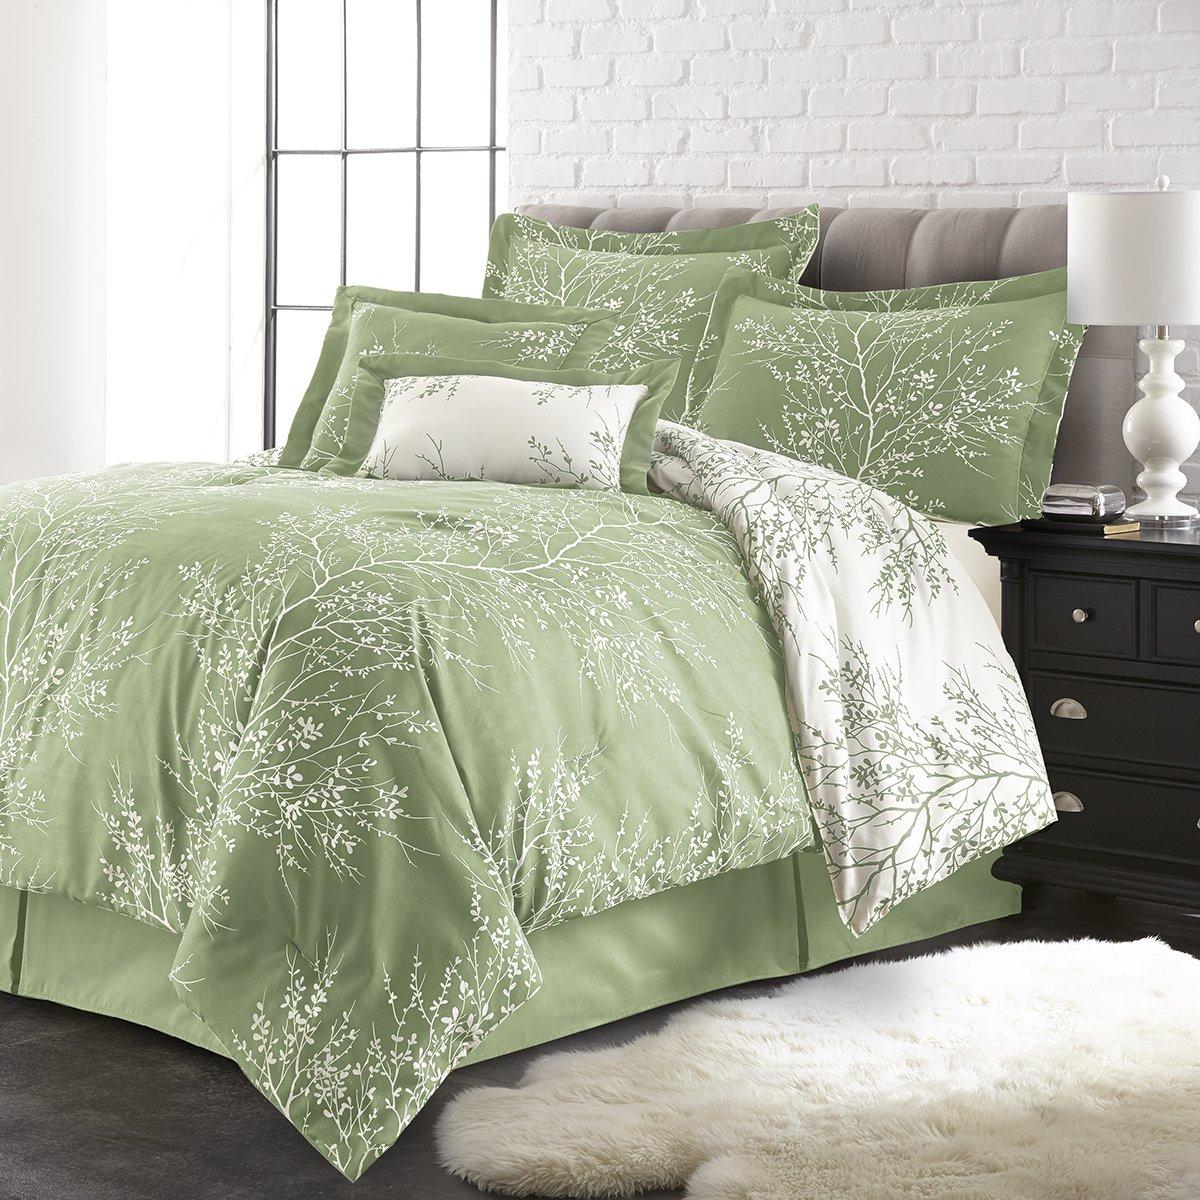 Spirit Linen, Inc Hotel 5th Ave Plush Reversible Comforter Set, Queen, Sage/White